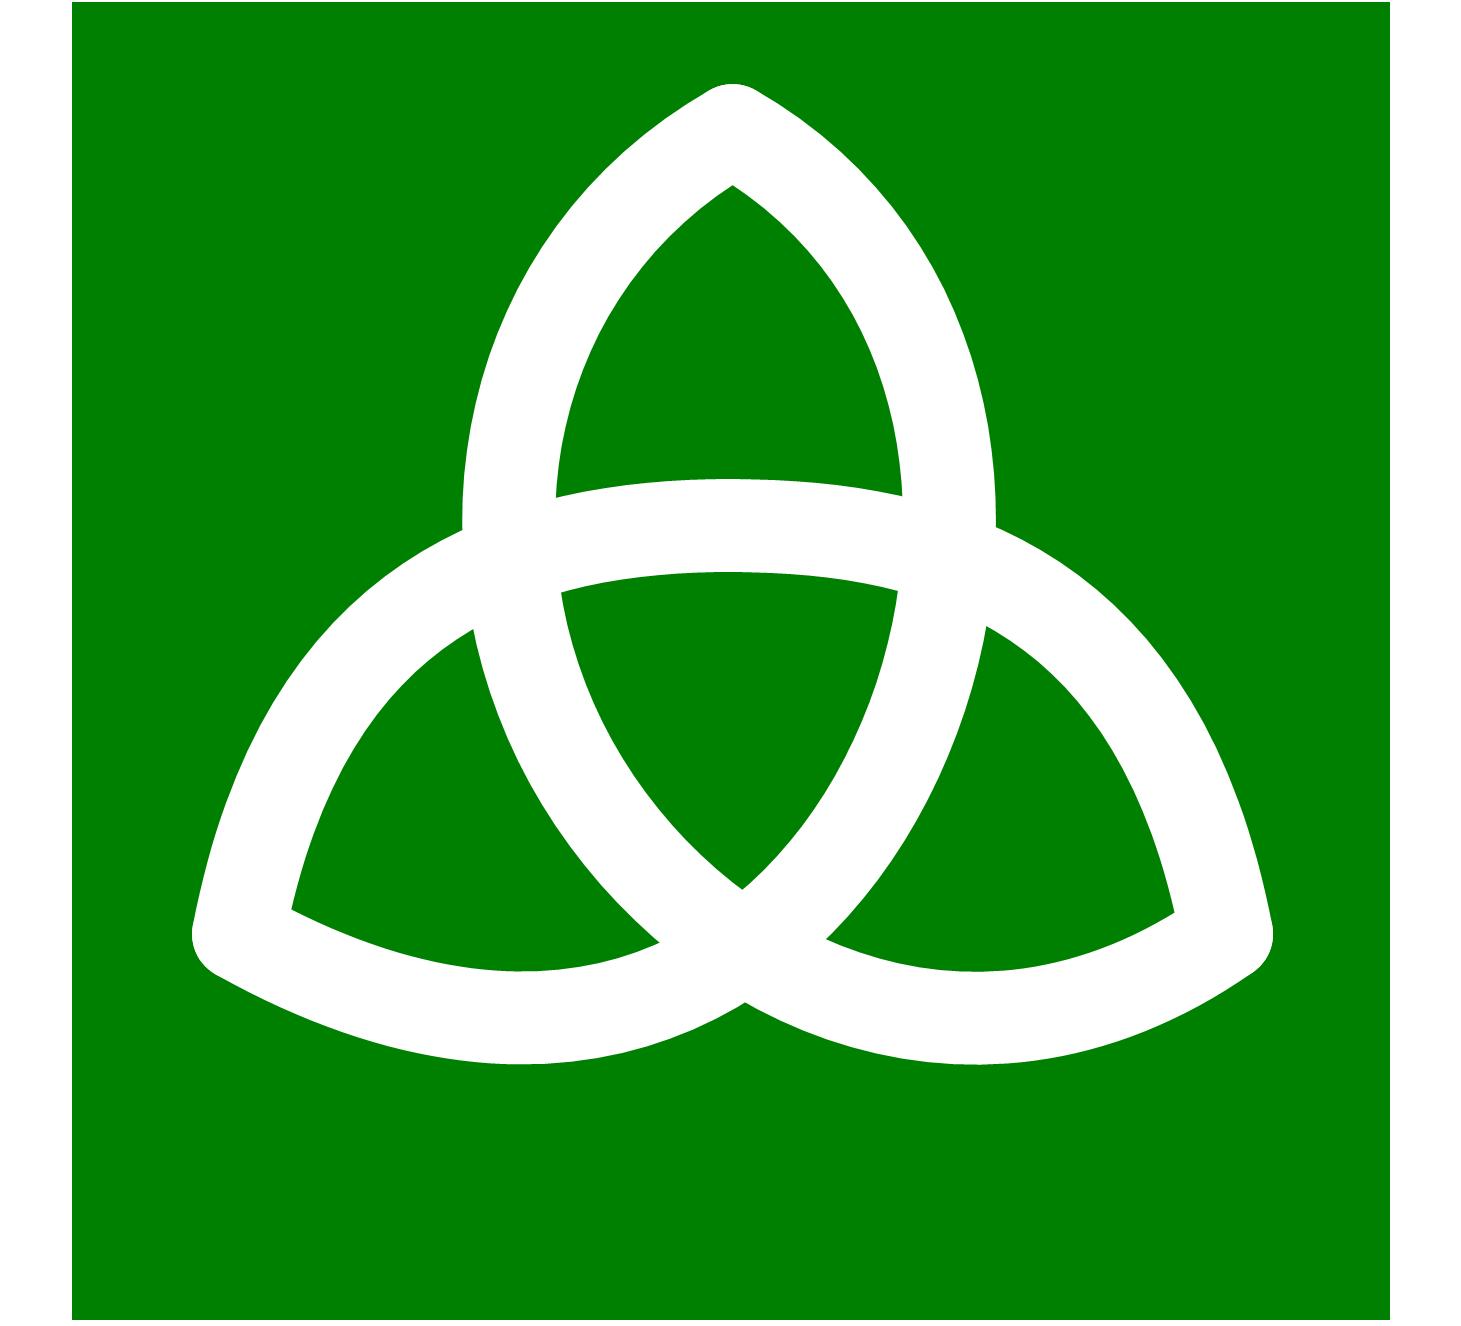 岩手県 葛巻町ロゴ